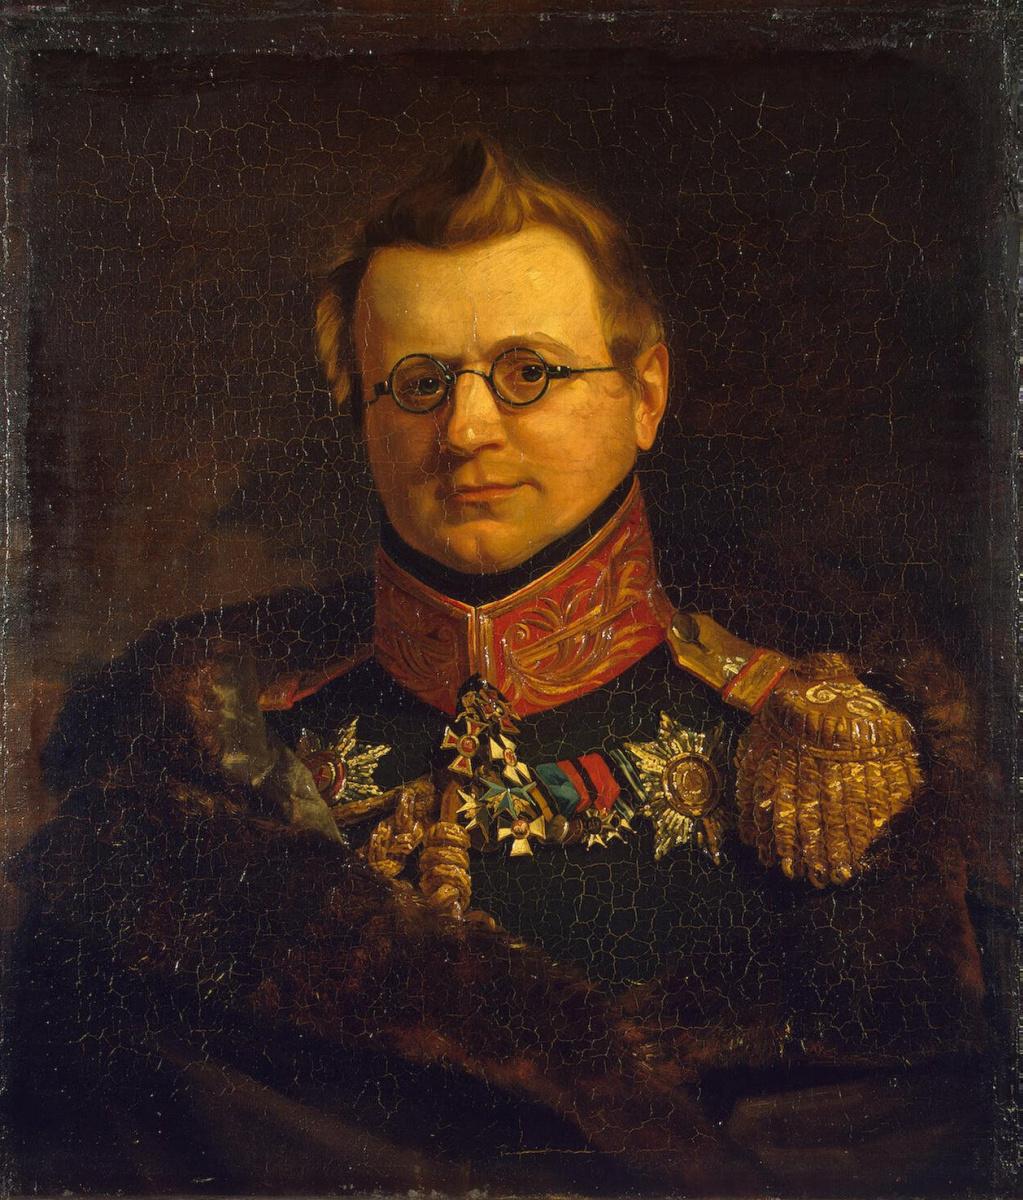 Джордж Доу. Портрет Станислава Станиславовича Потоцкого